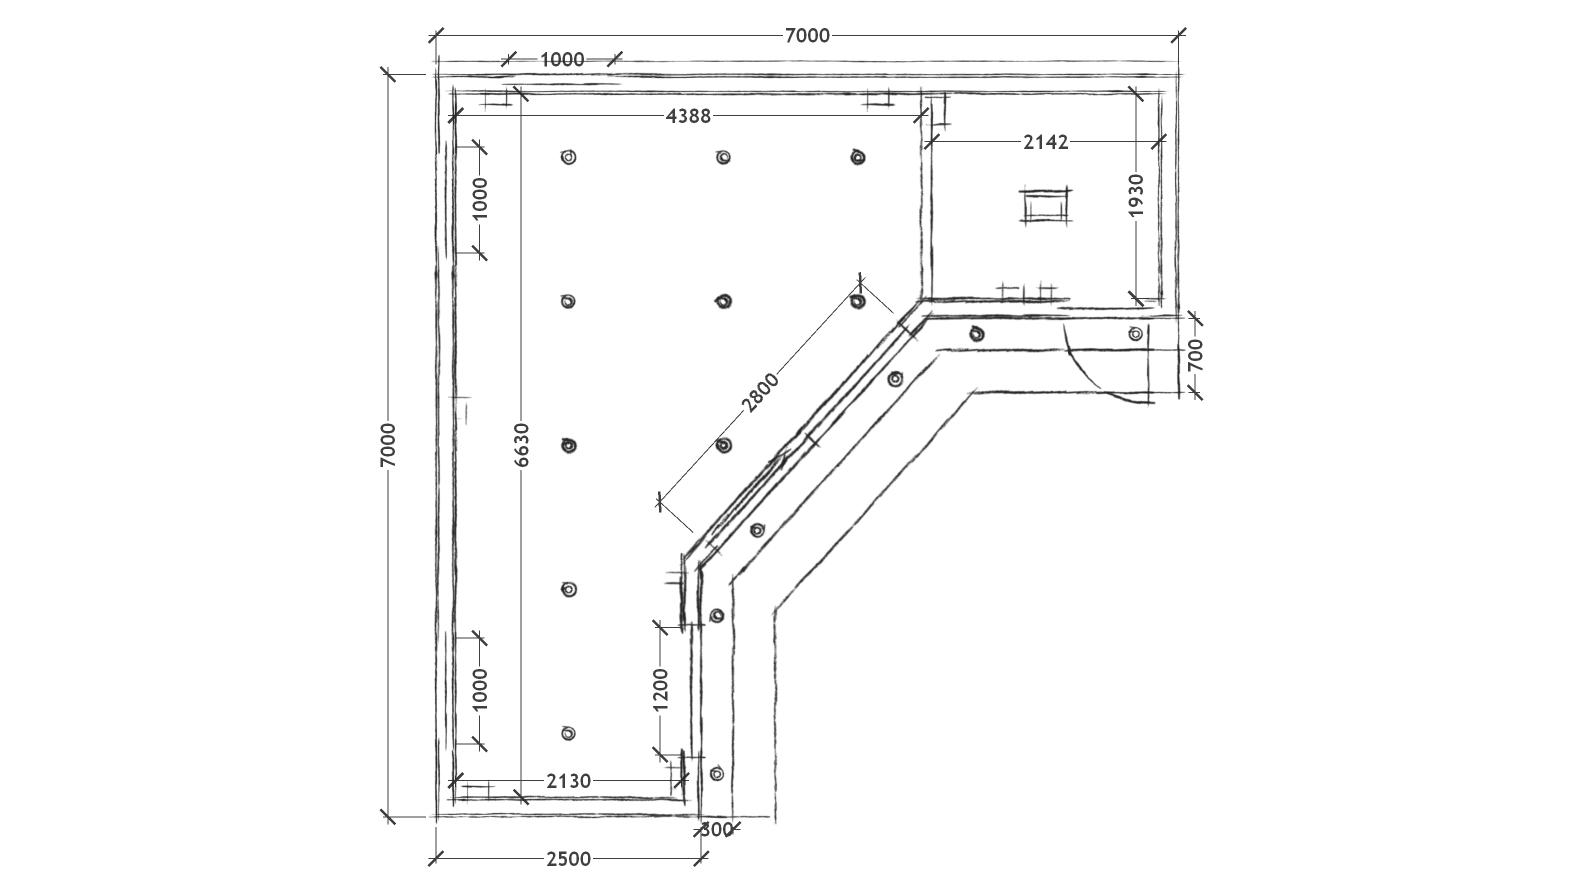 L-shaped garden room sketch